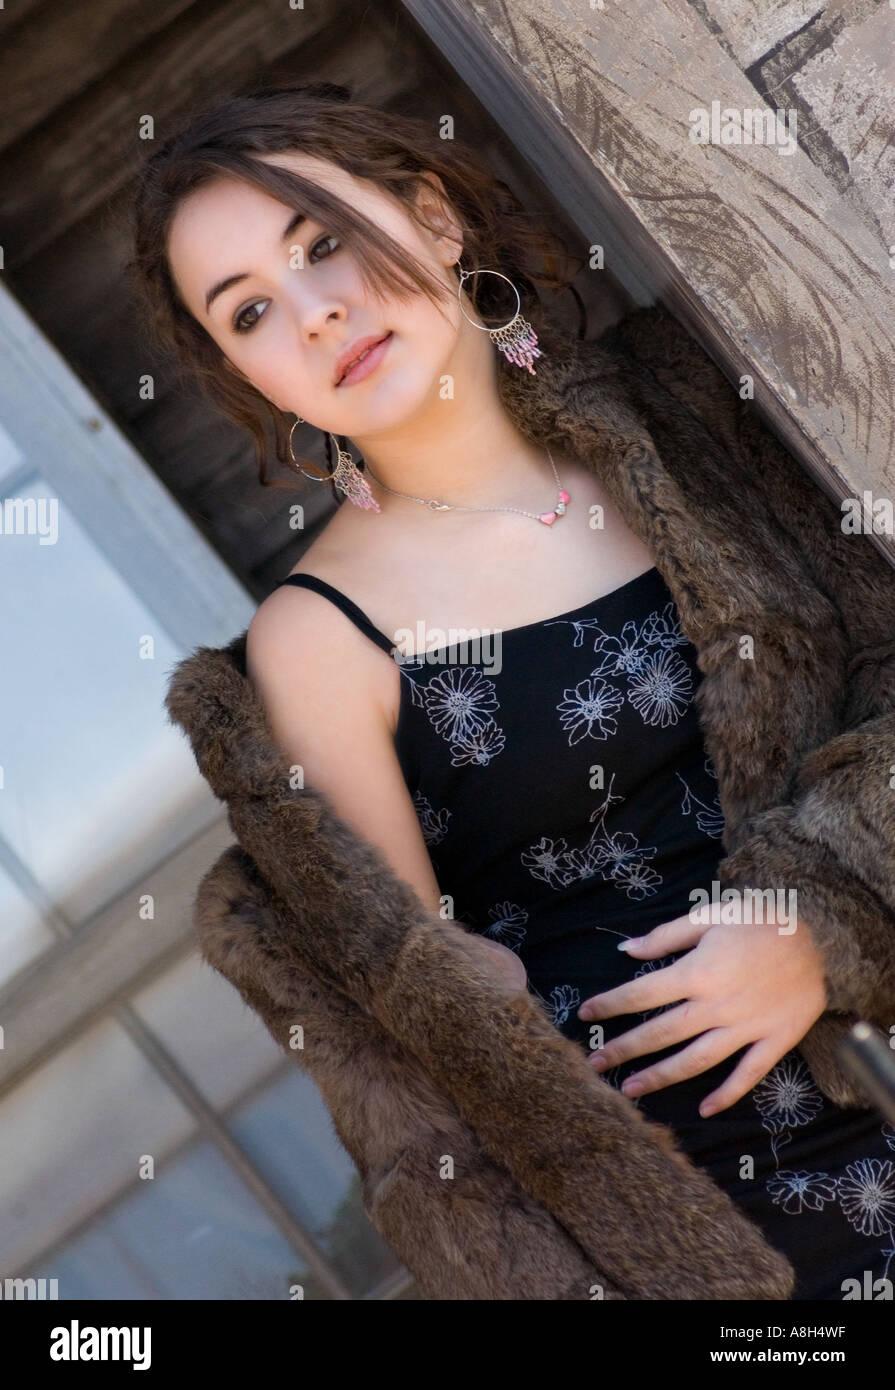 Caucasian Teen Girl 13 To 15 Years Wearing Black Evening